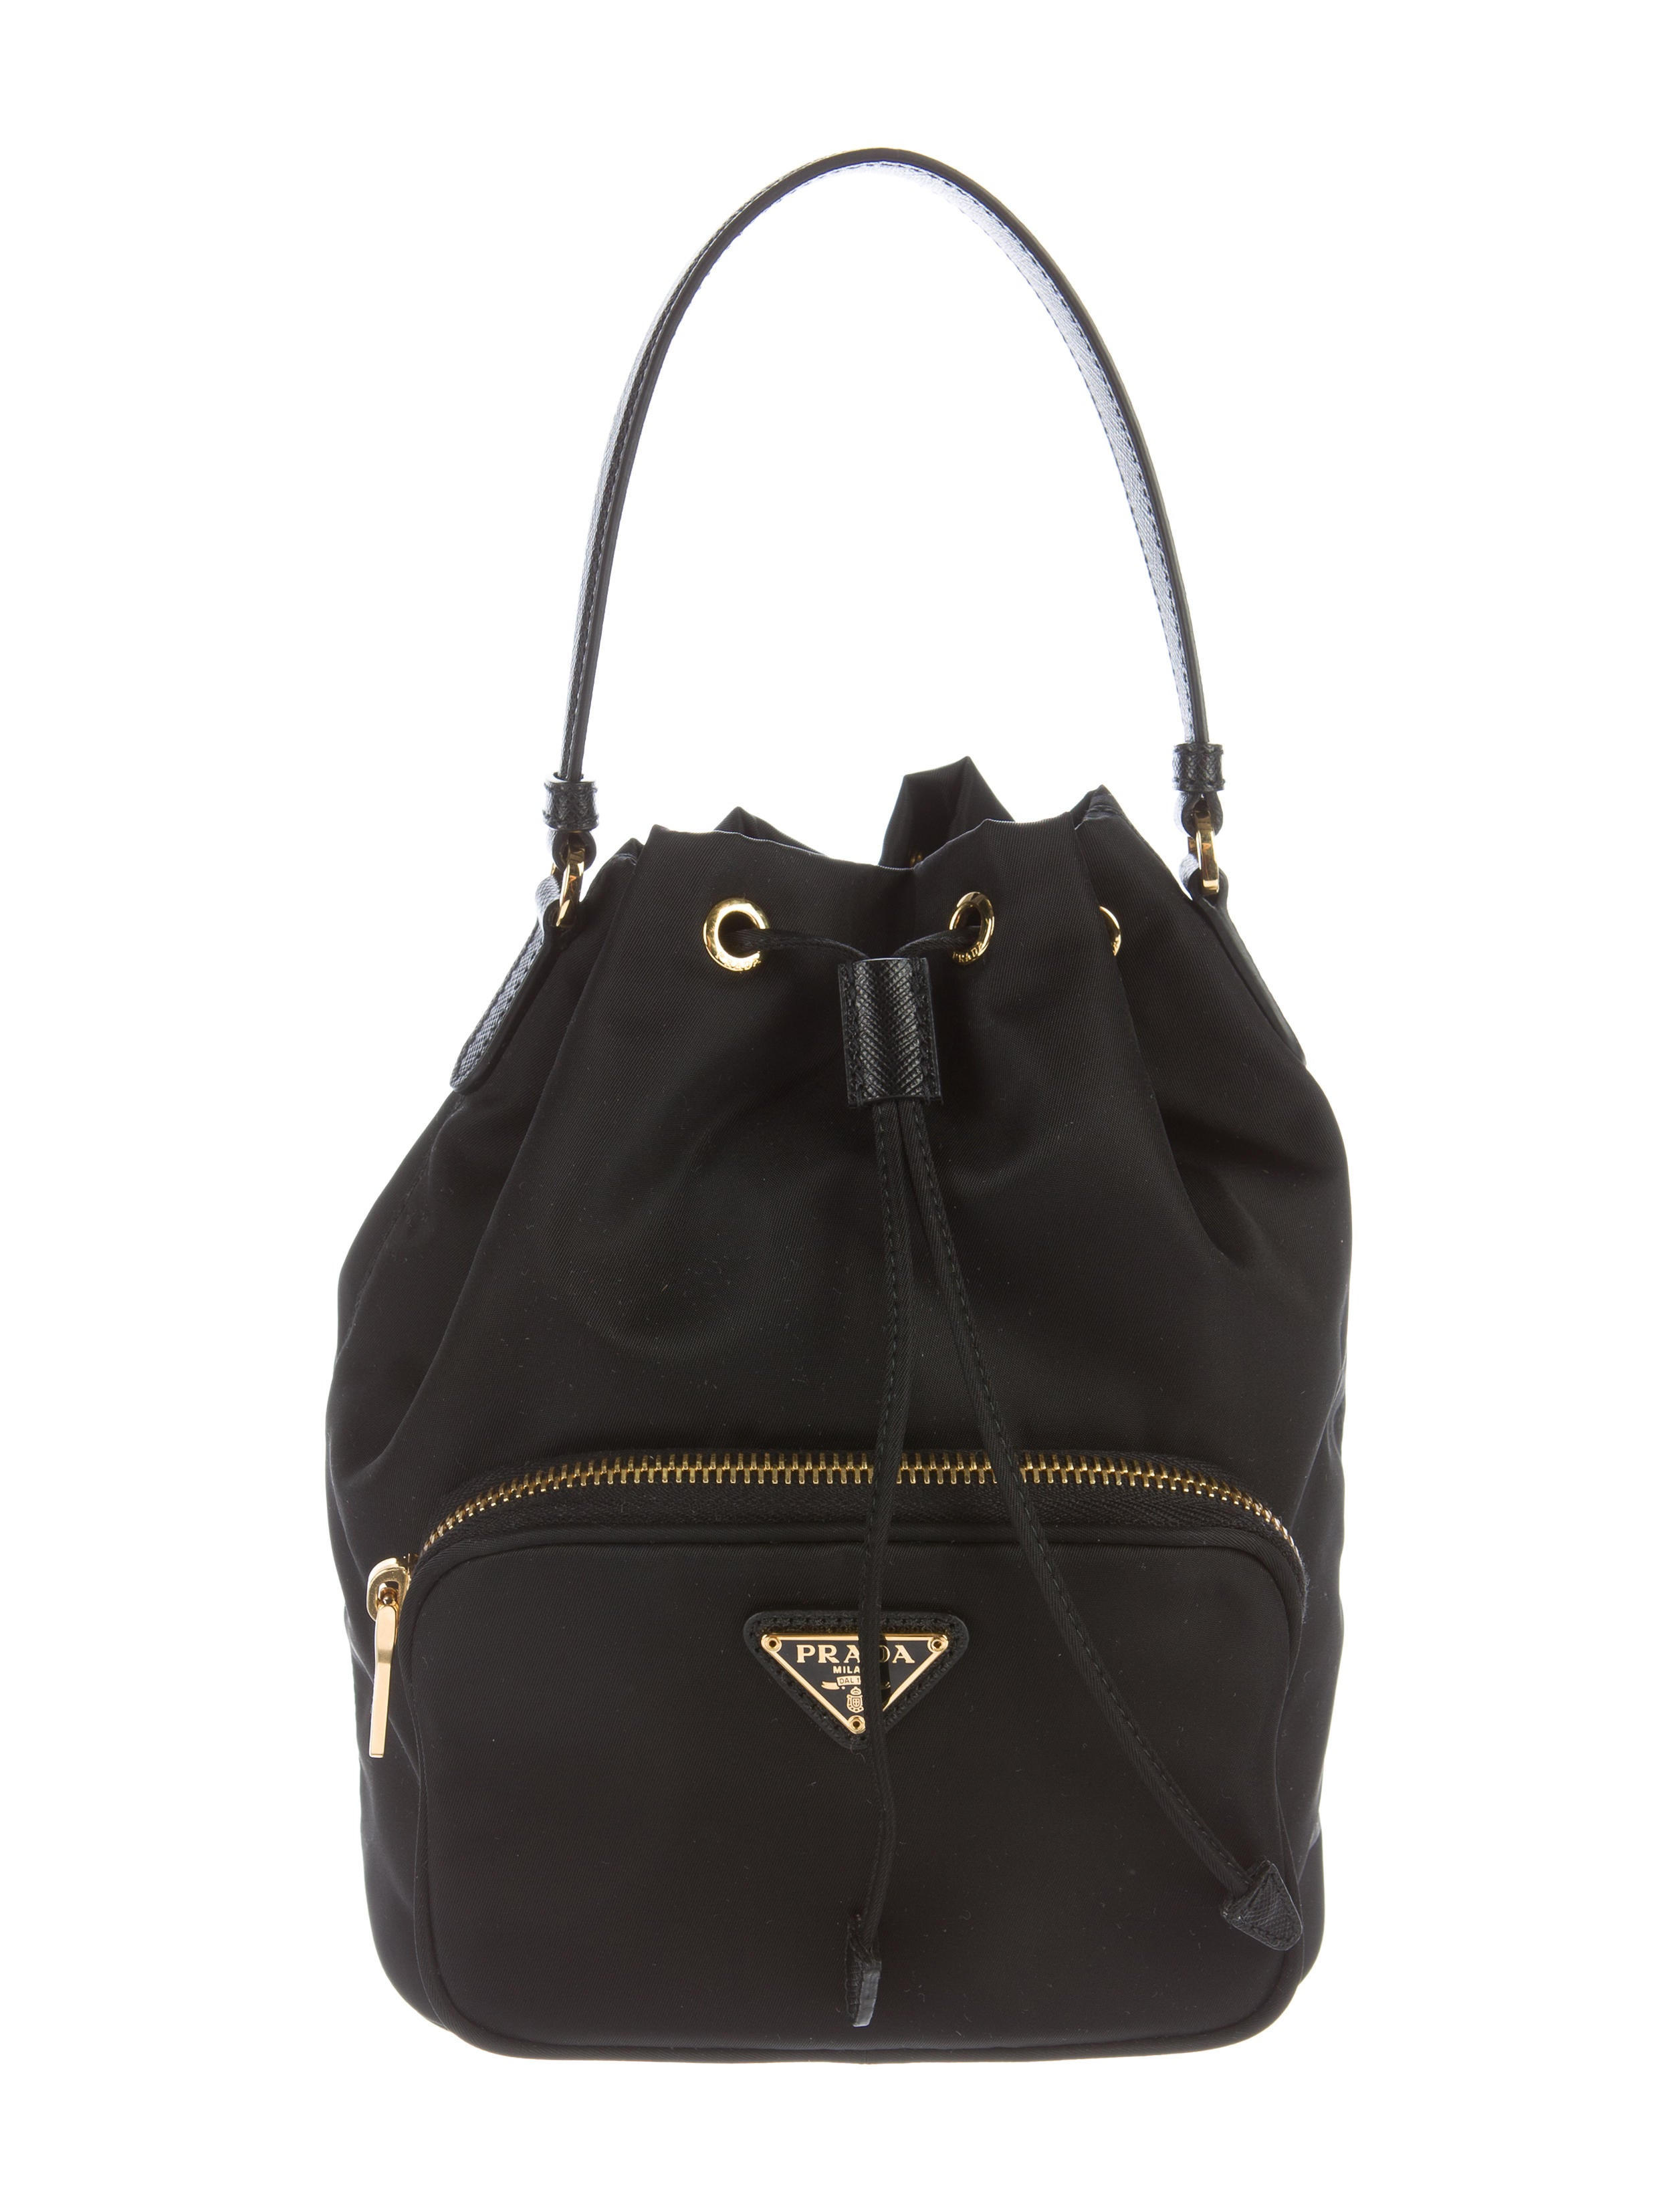 7c8568aac0cd australia prada tote bag womens handbags compare prices and buy online  251ec 35e8f  coupon prada mini bags uk e4f85 2d6ff